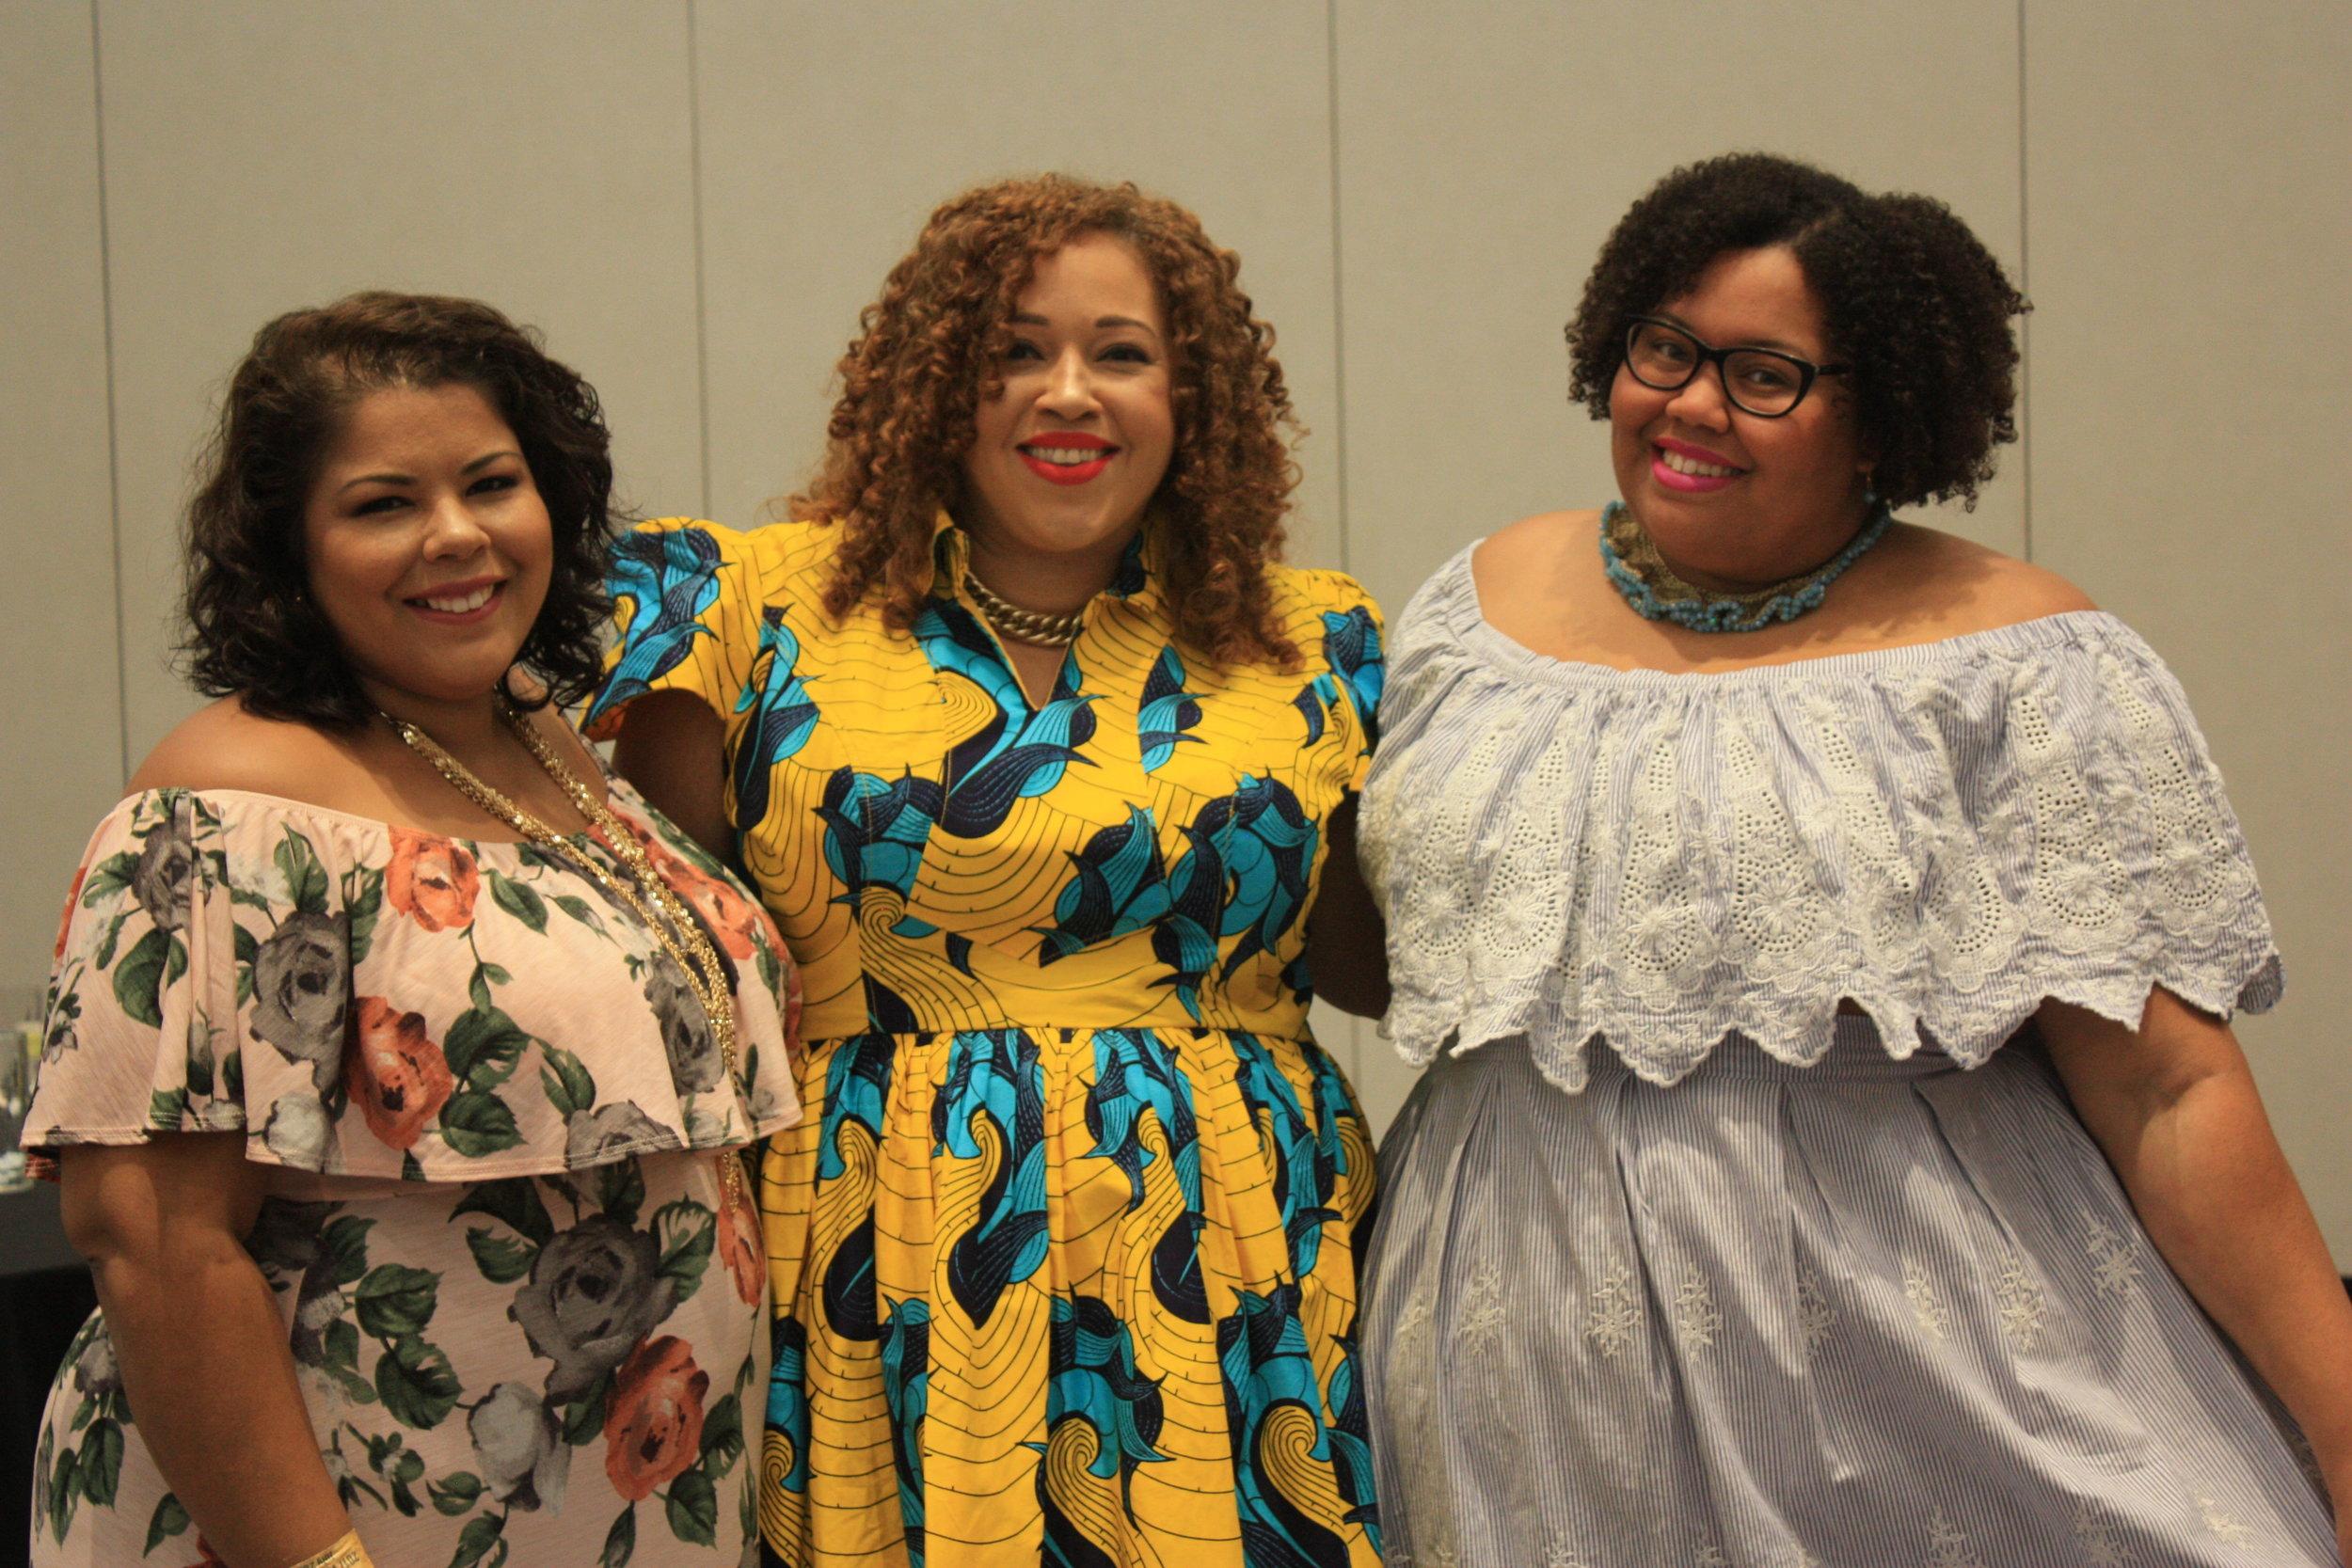 Darlene (SuitsHeelsandCurves), Sandra (LapecosaPreciosa), and Me (EclecticKurves)